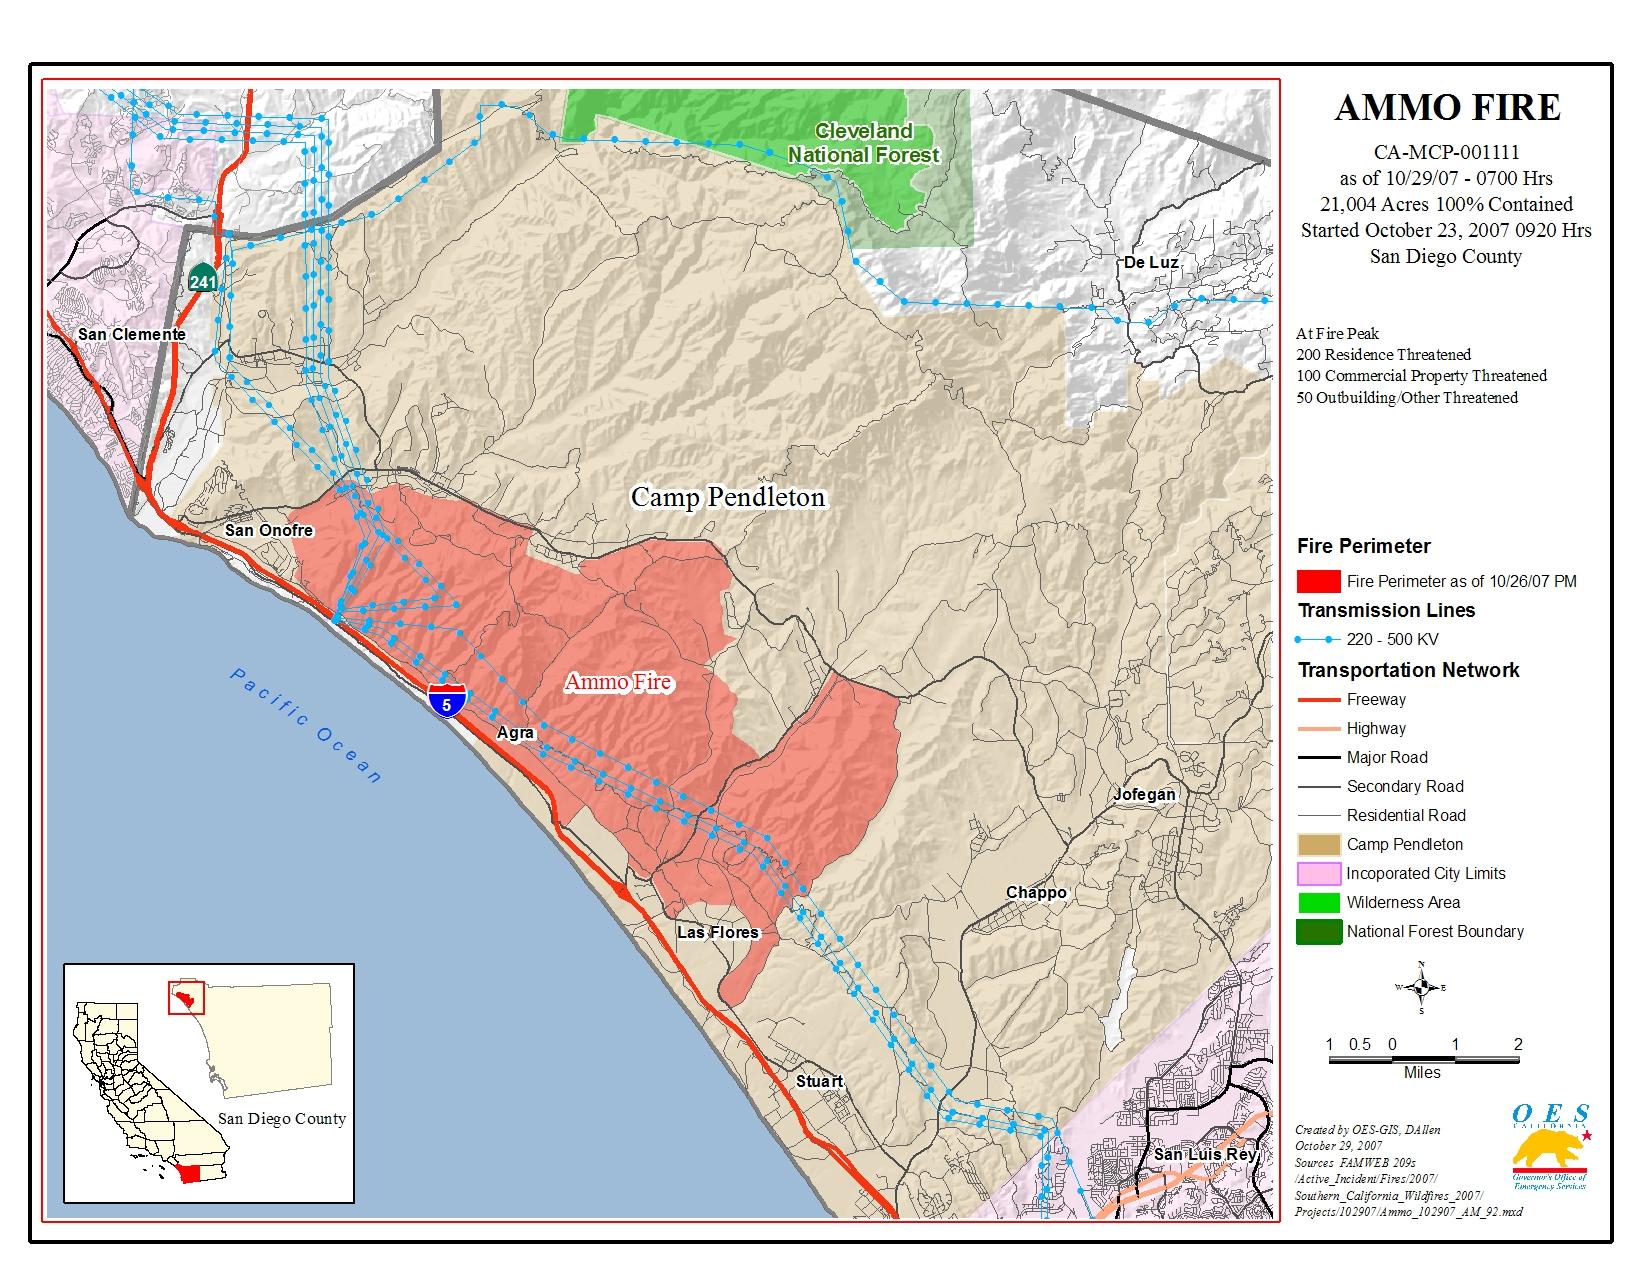 Ca Oes, Fire - Socal 2007 - Current Fire Map California